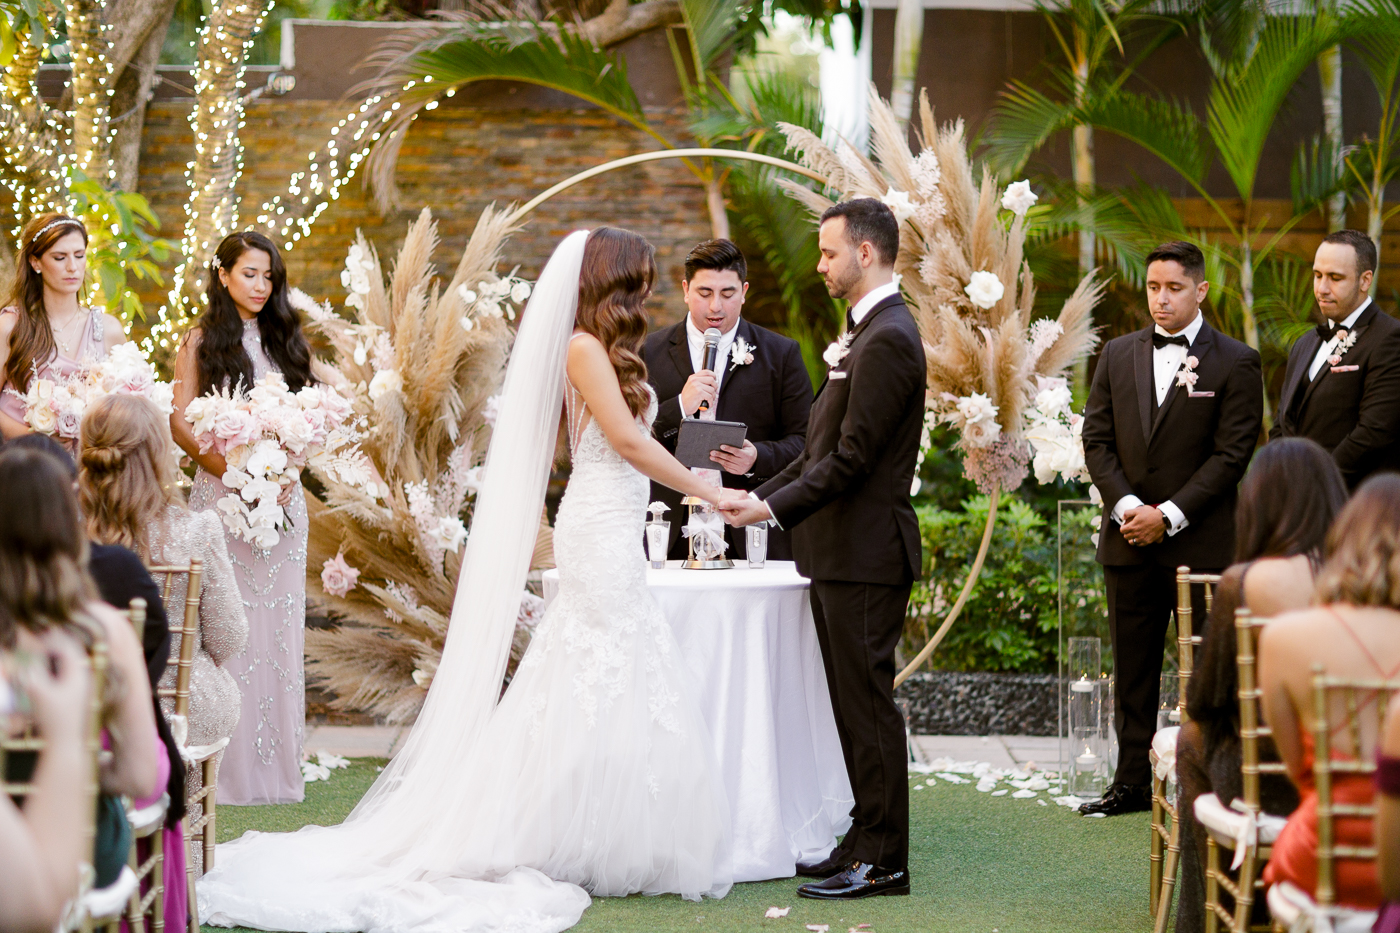 Karen & Caio – ceremony (7 of 10)